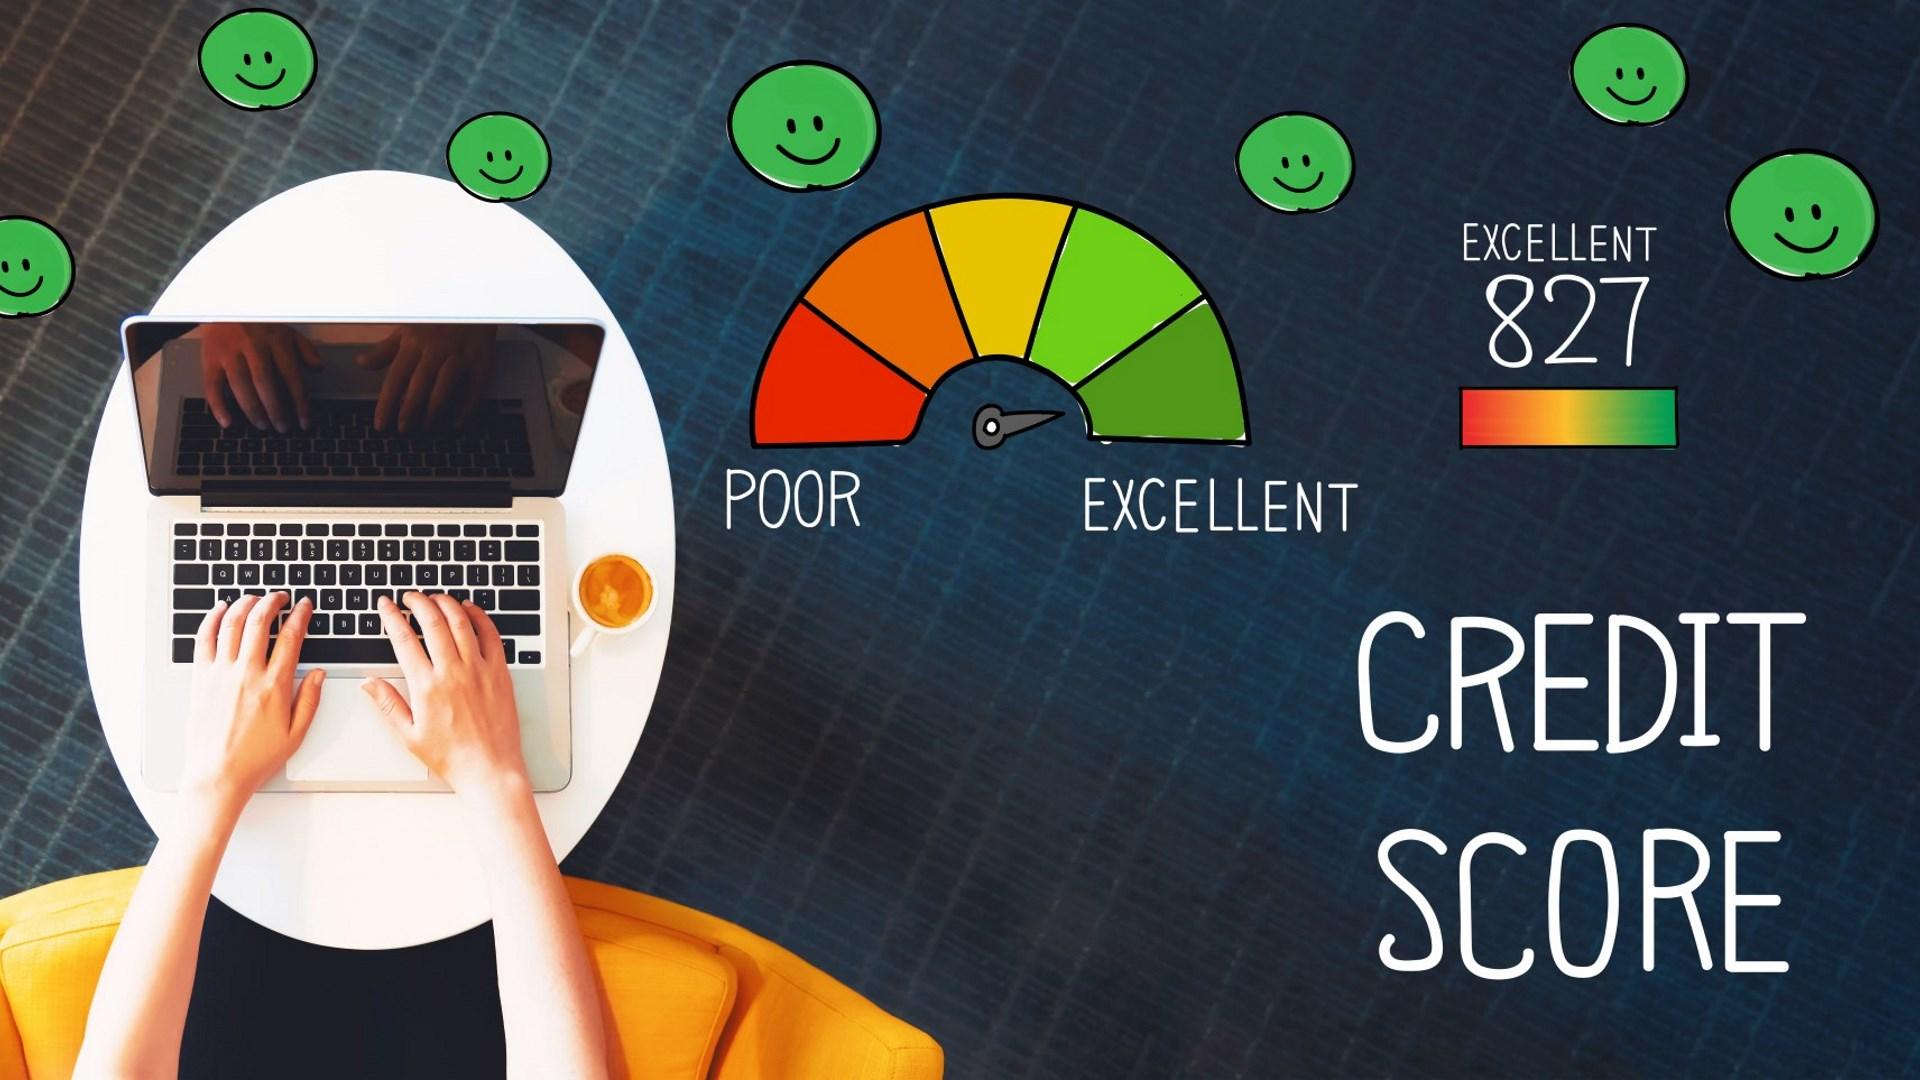 foto de Get Free credit score: Score Check and Credit monitoring - Microsoft ...